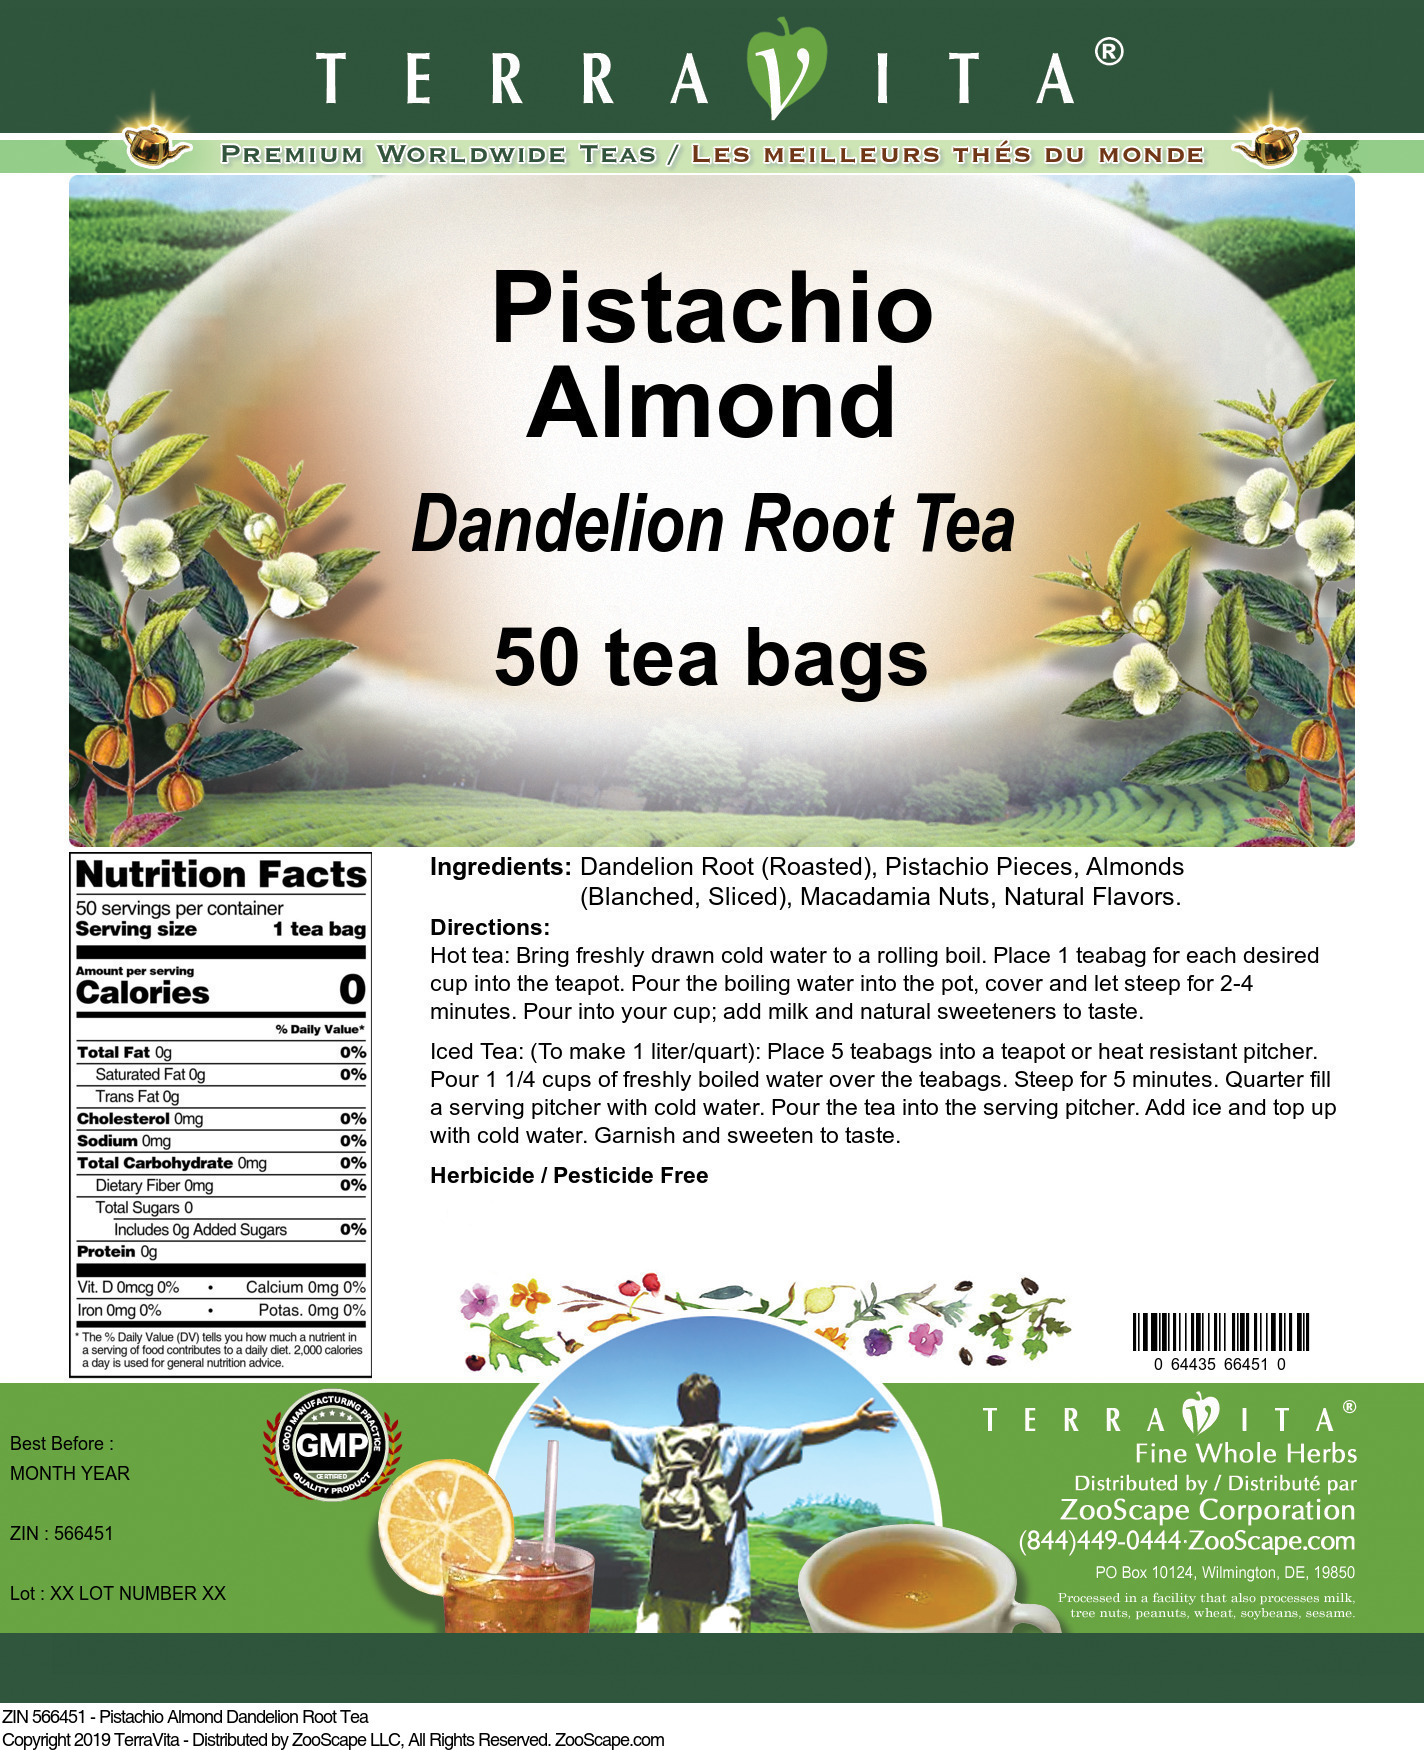 Pistachio Almond Dandelion Root Tea